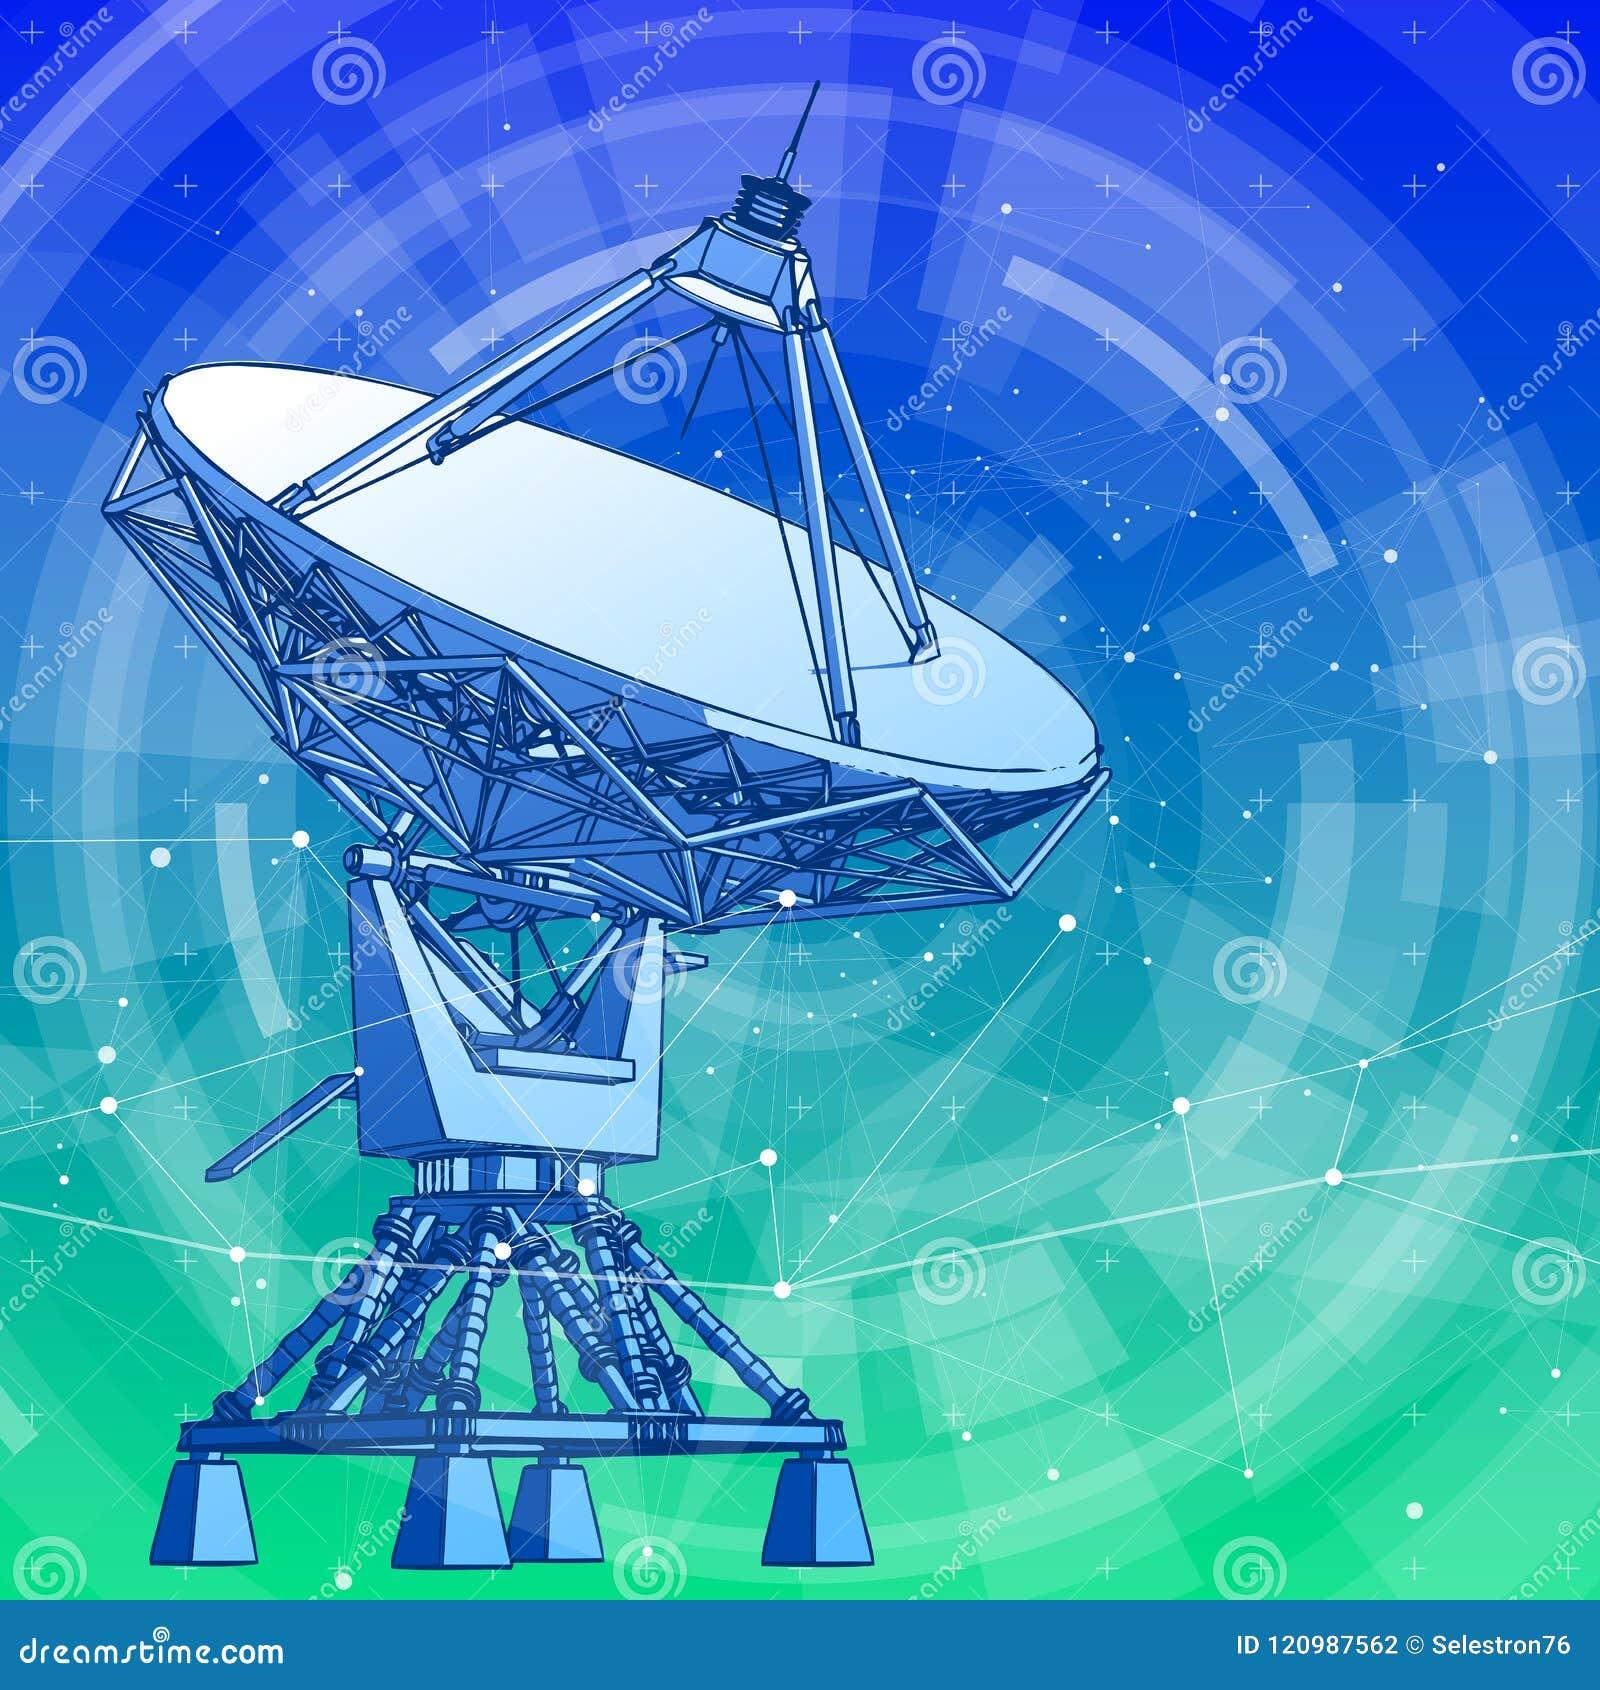 Antenne d antennes paraboliques - radar Doppler et fond bleu de technologie